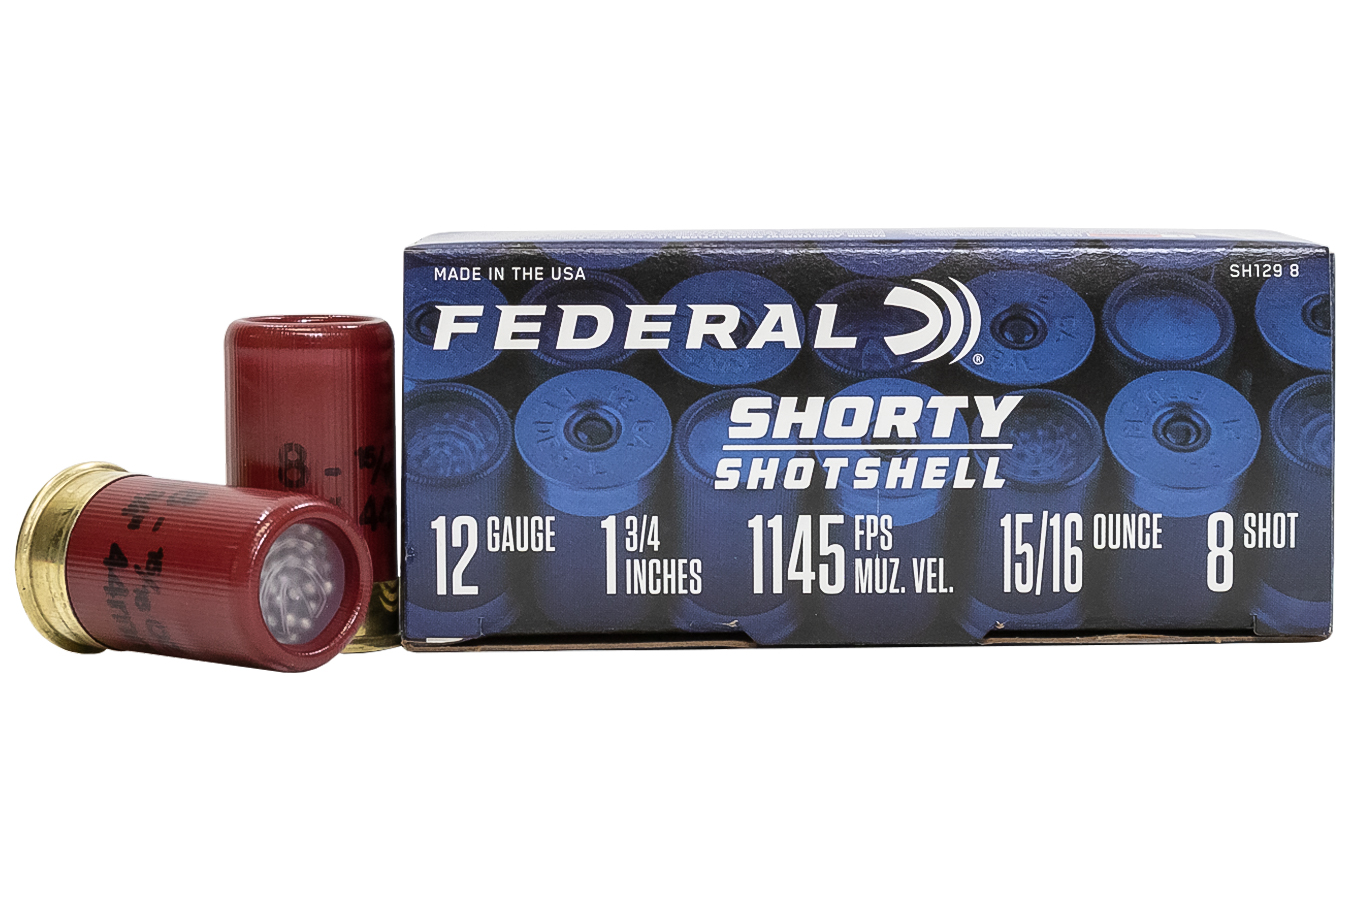 12 Gauge 1-3/4 in 5/16 oz 8 Shot Shorty Shotshell 10/Box